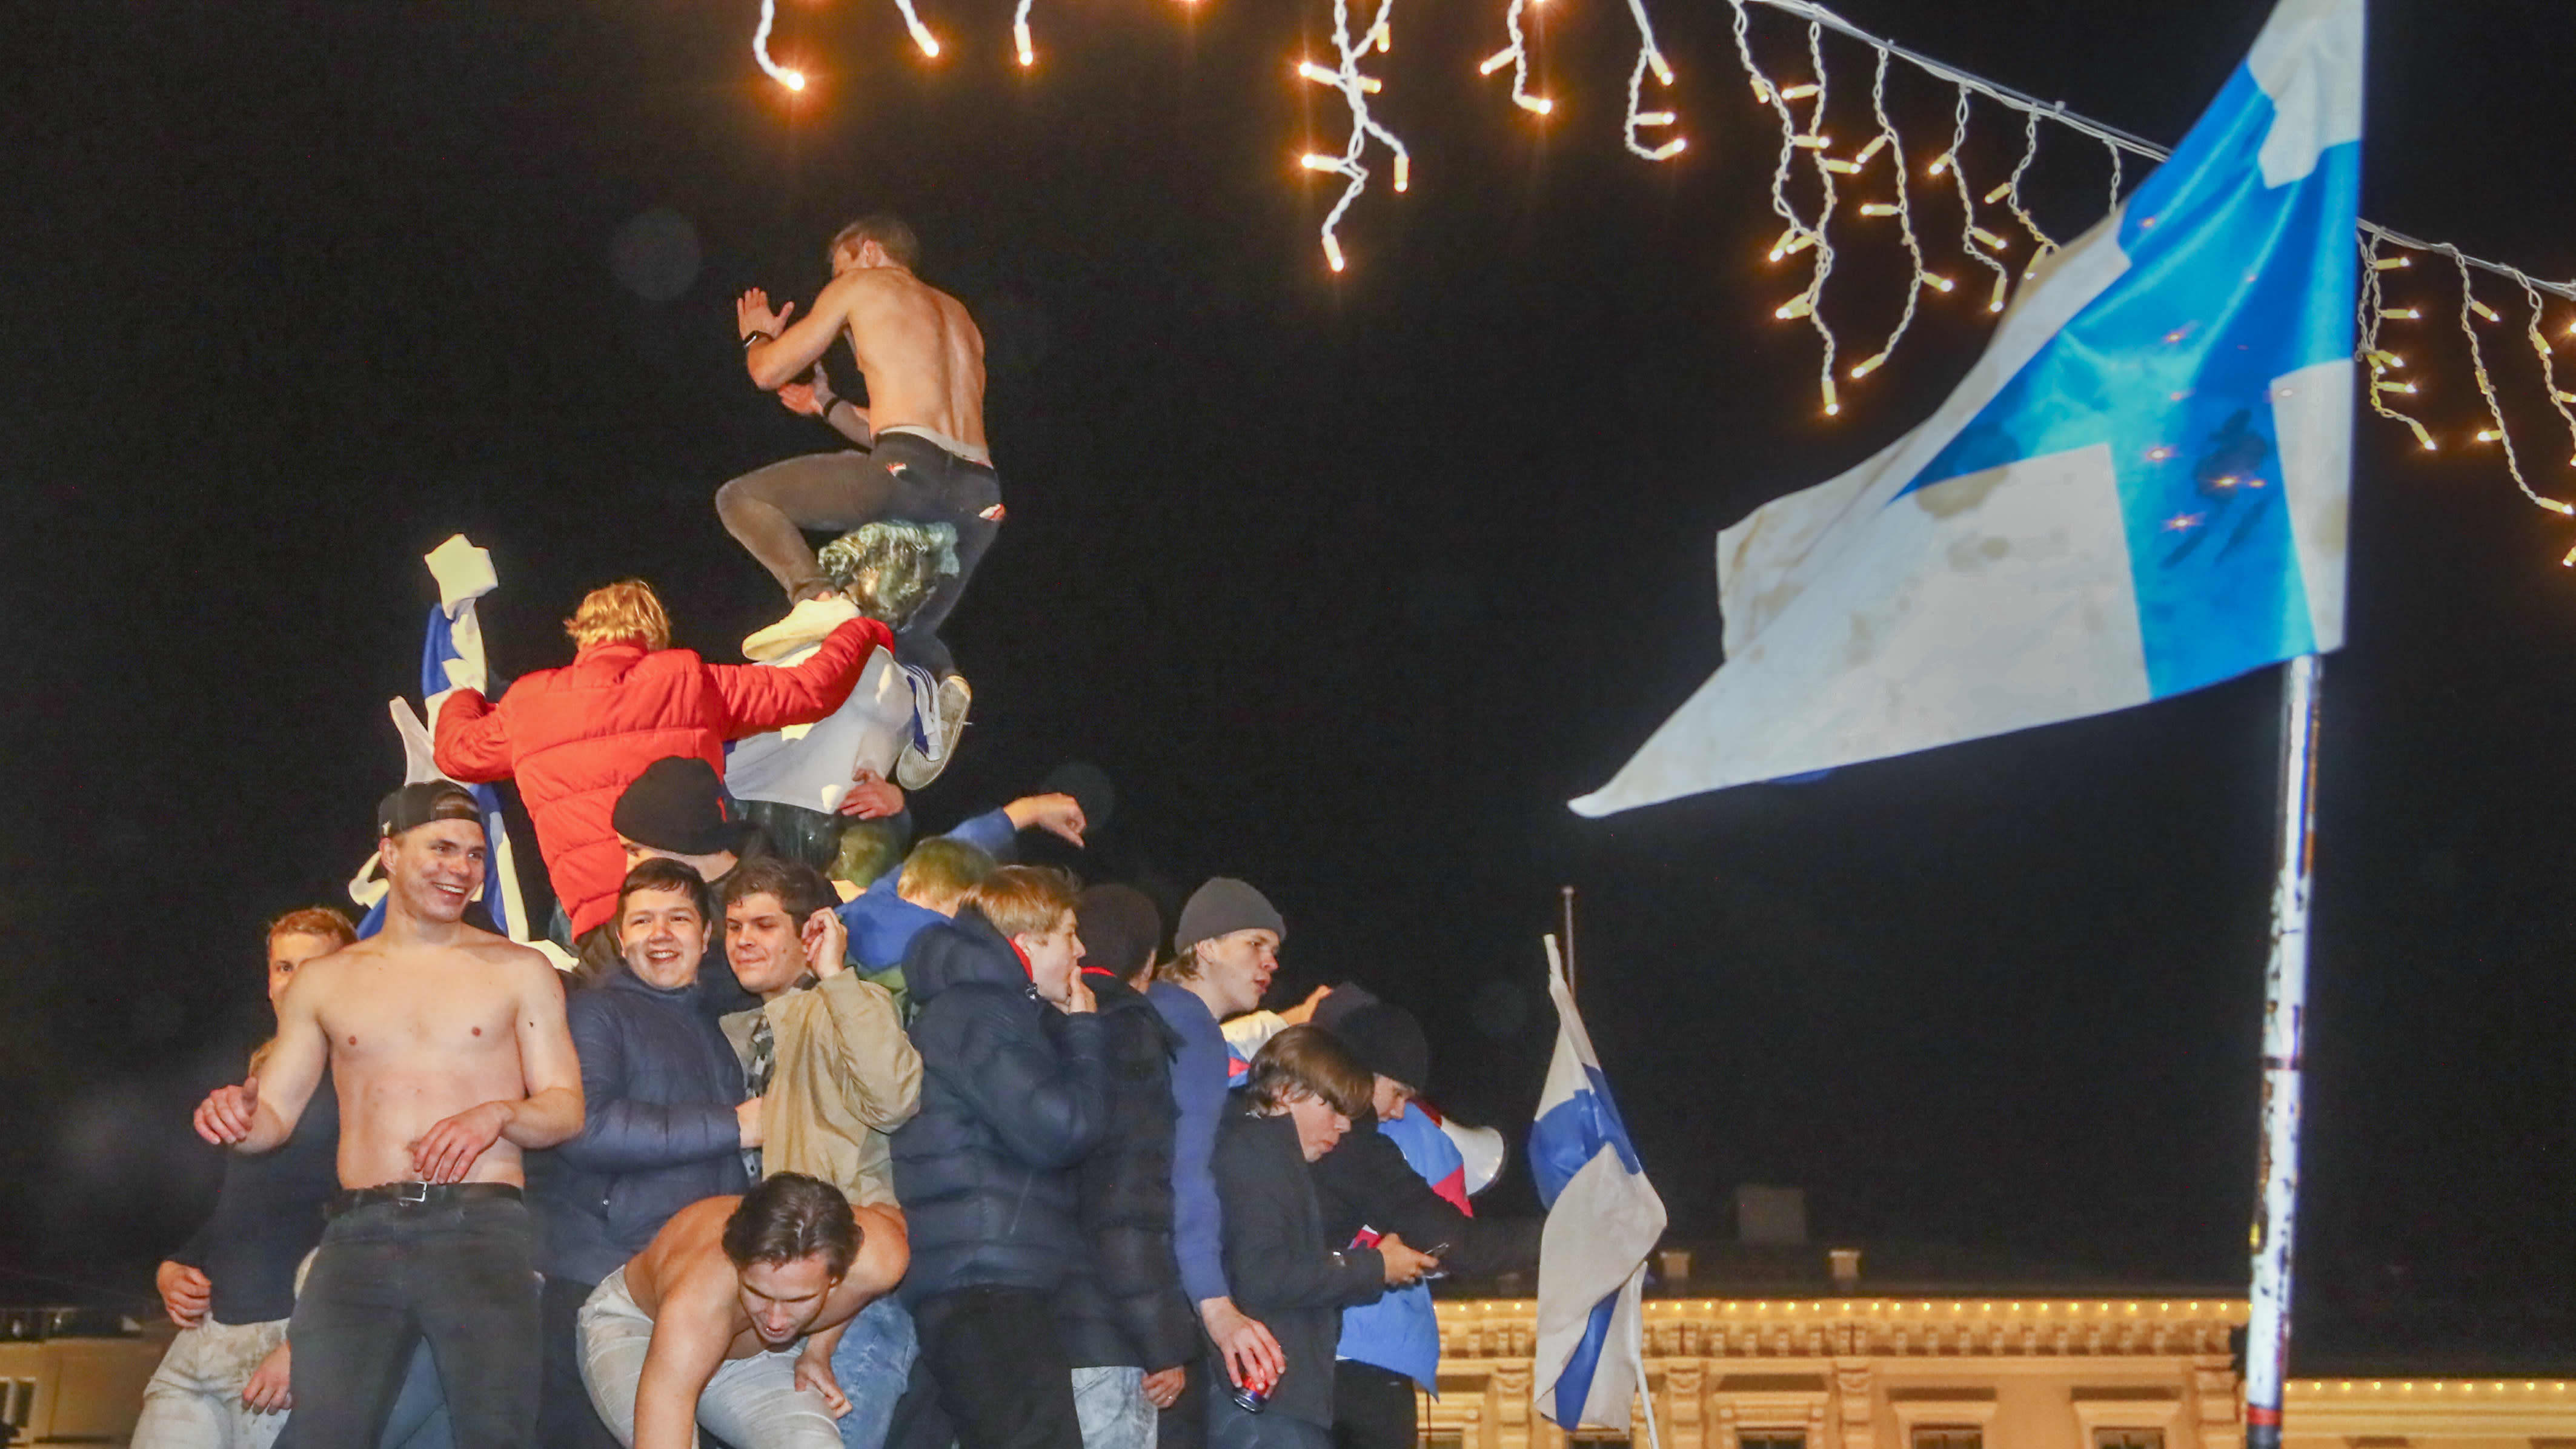 Jalkapallofanit sekoavat Suomen EM-kisapaikan ratkettua.